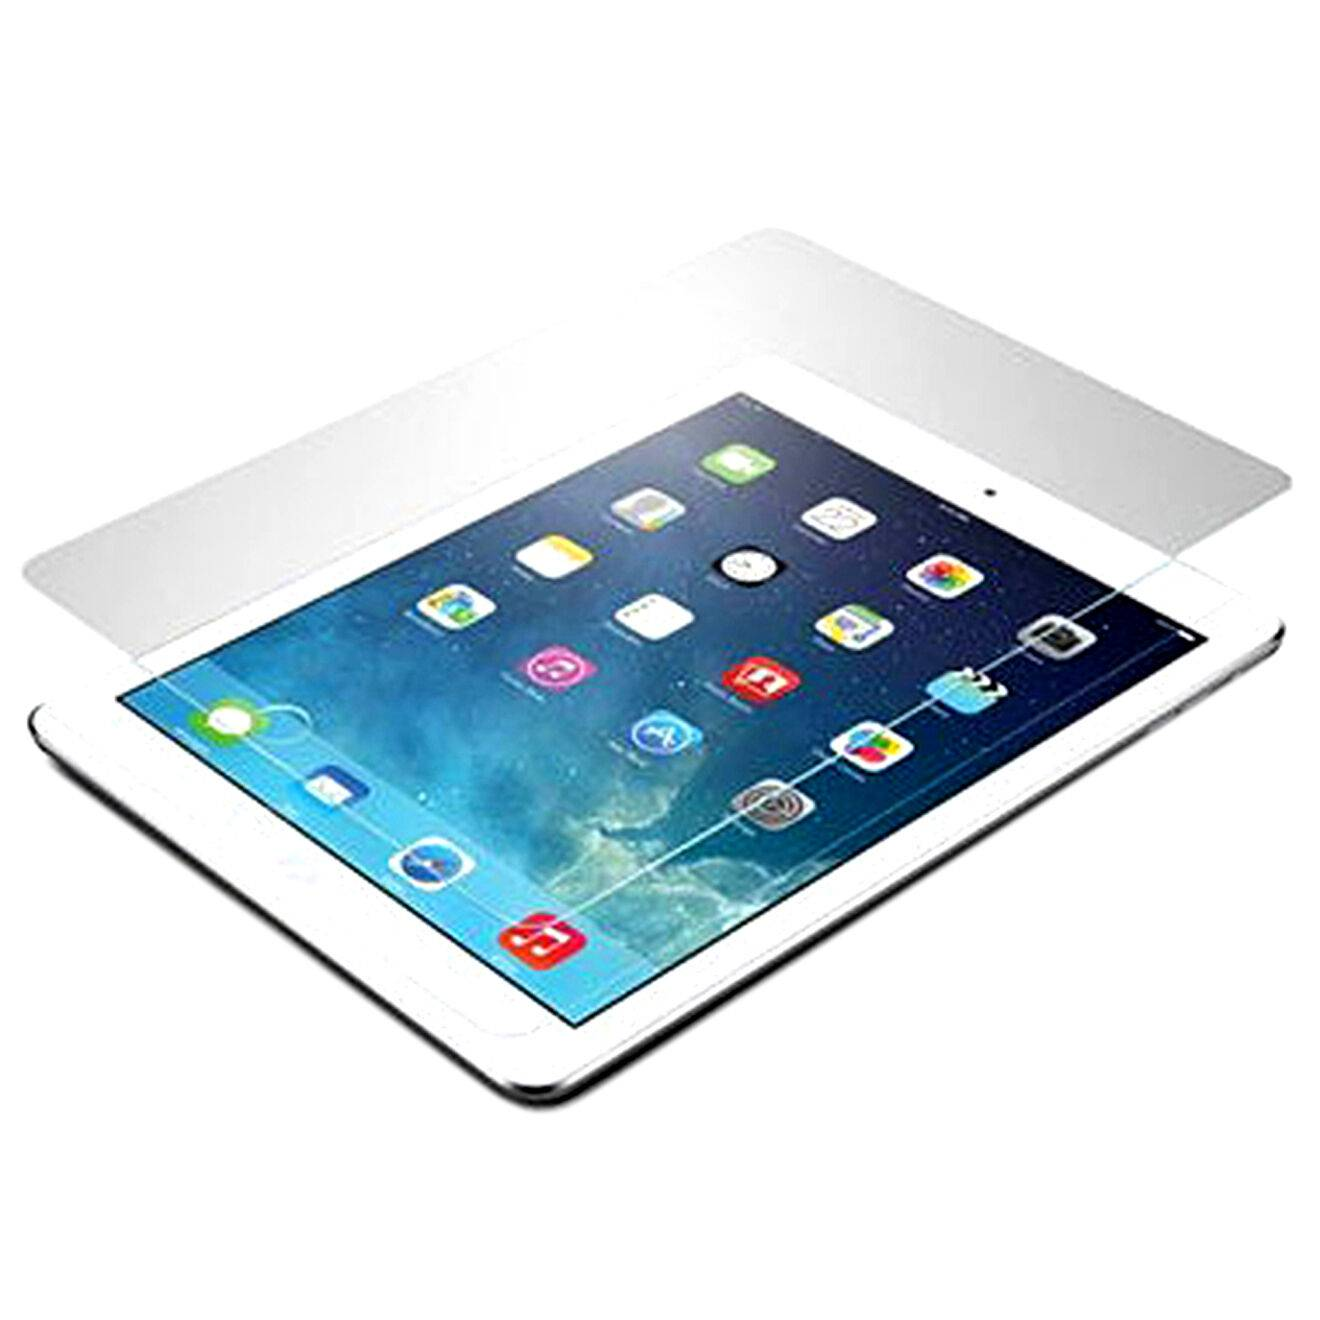 Inki Vitre de protection en verre trempé iPad Air/Air 2 - transparente